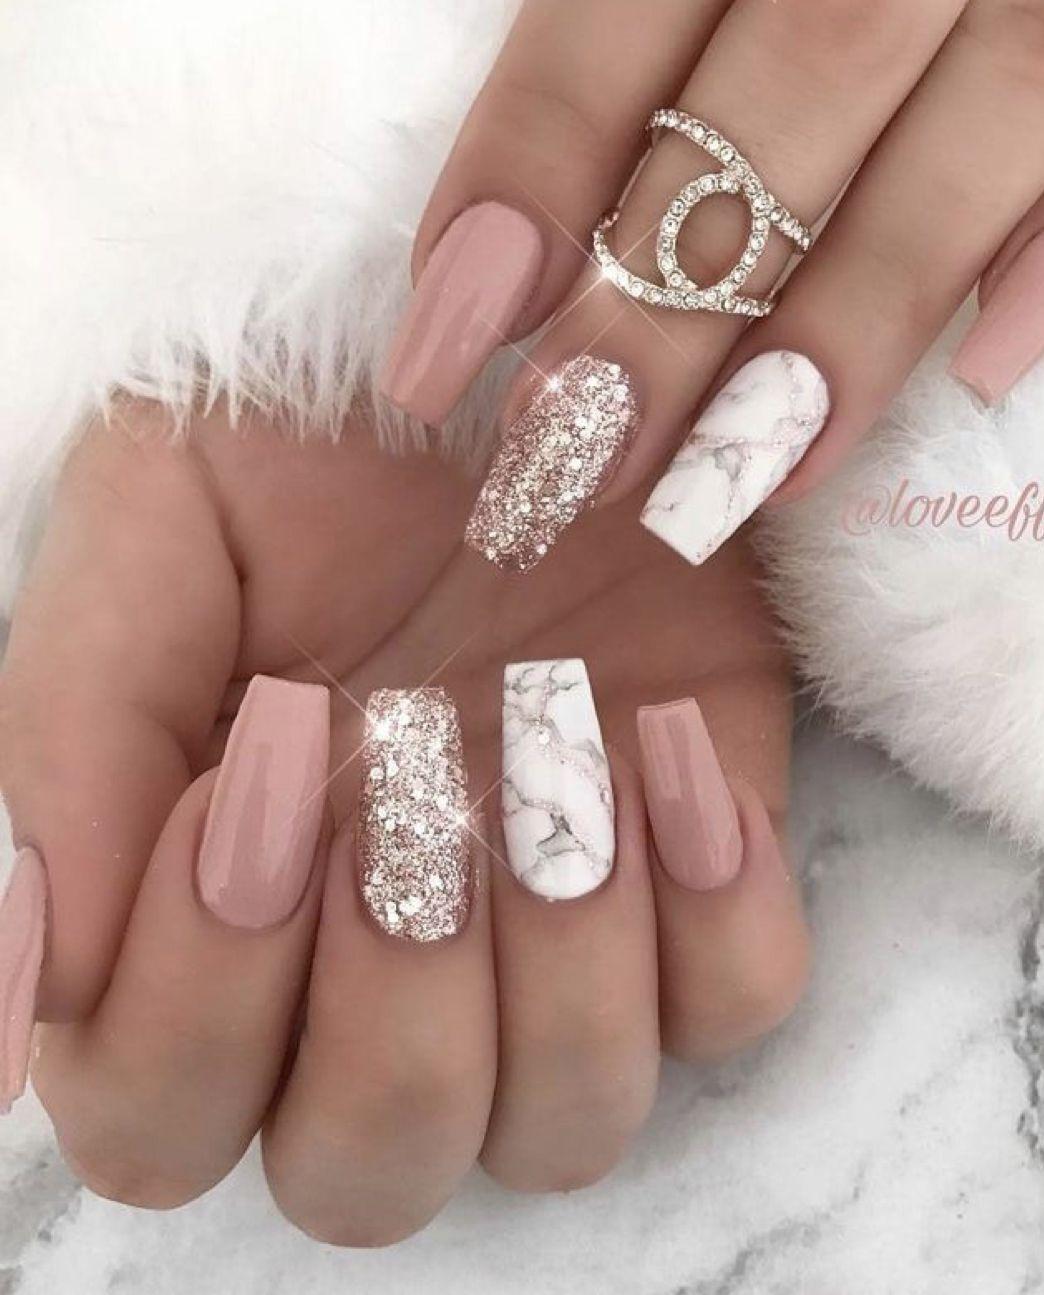 Pin By Veru123 On Nails Zlate Nehty Design Nehtu Gelove Nehty